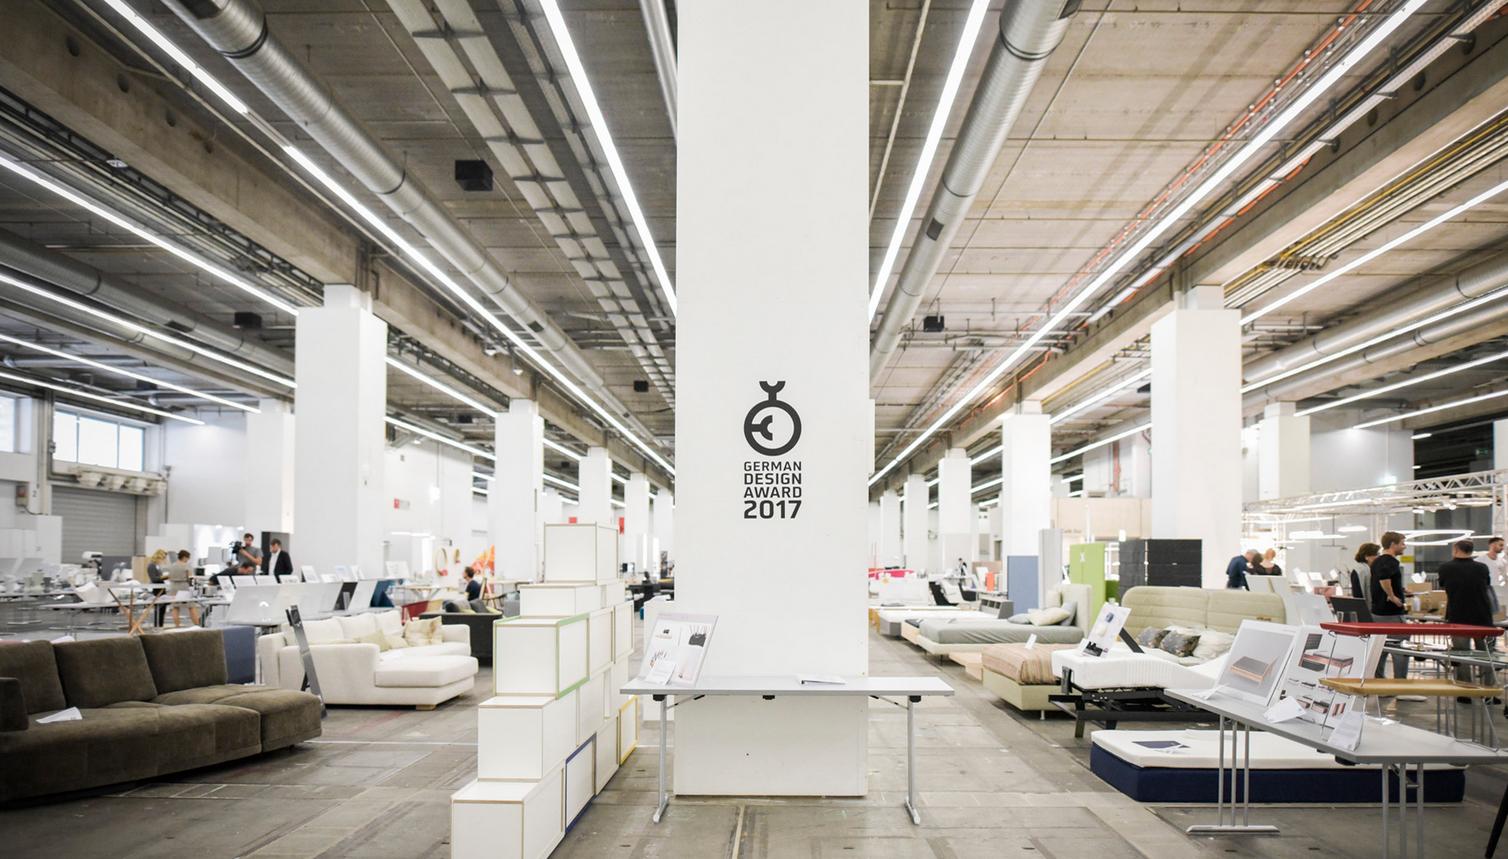 Voltasol German Design Award 2017.png